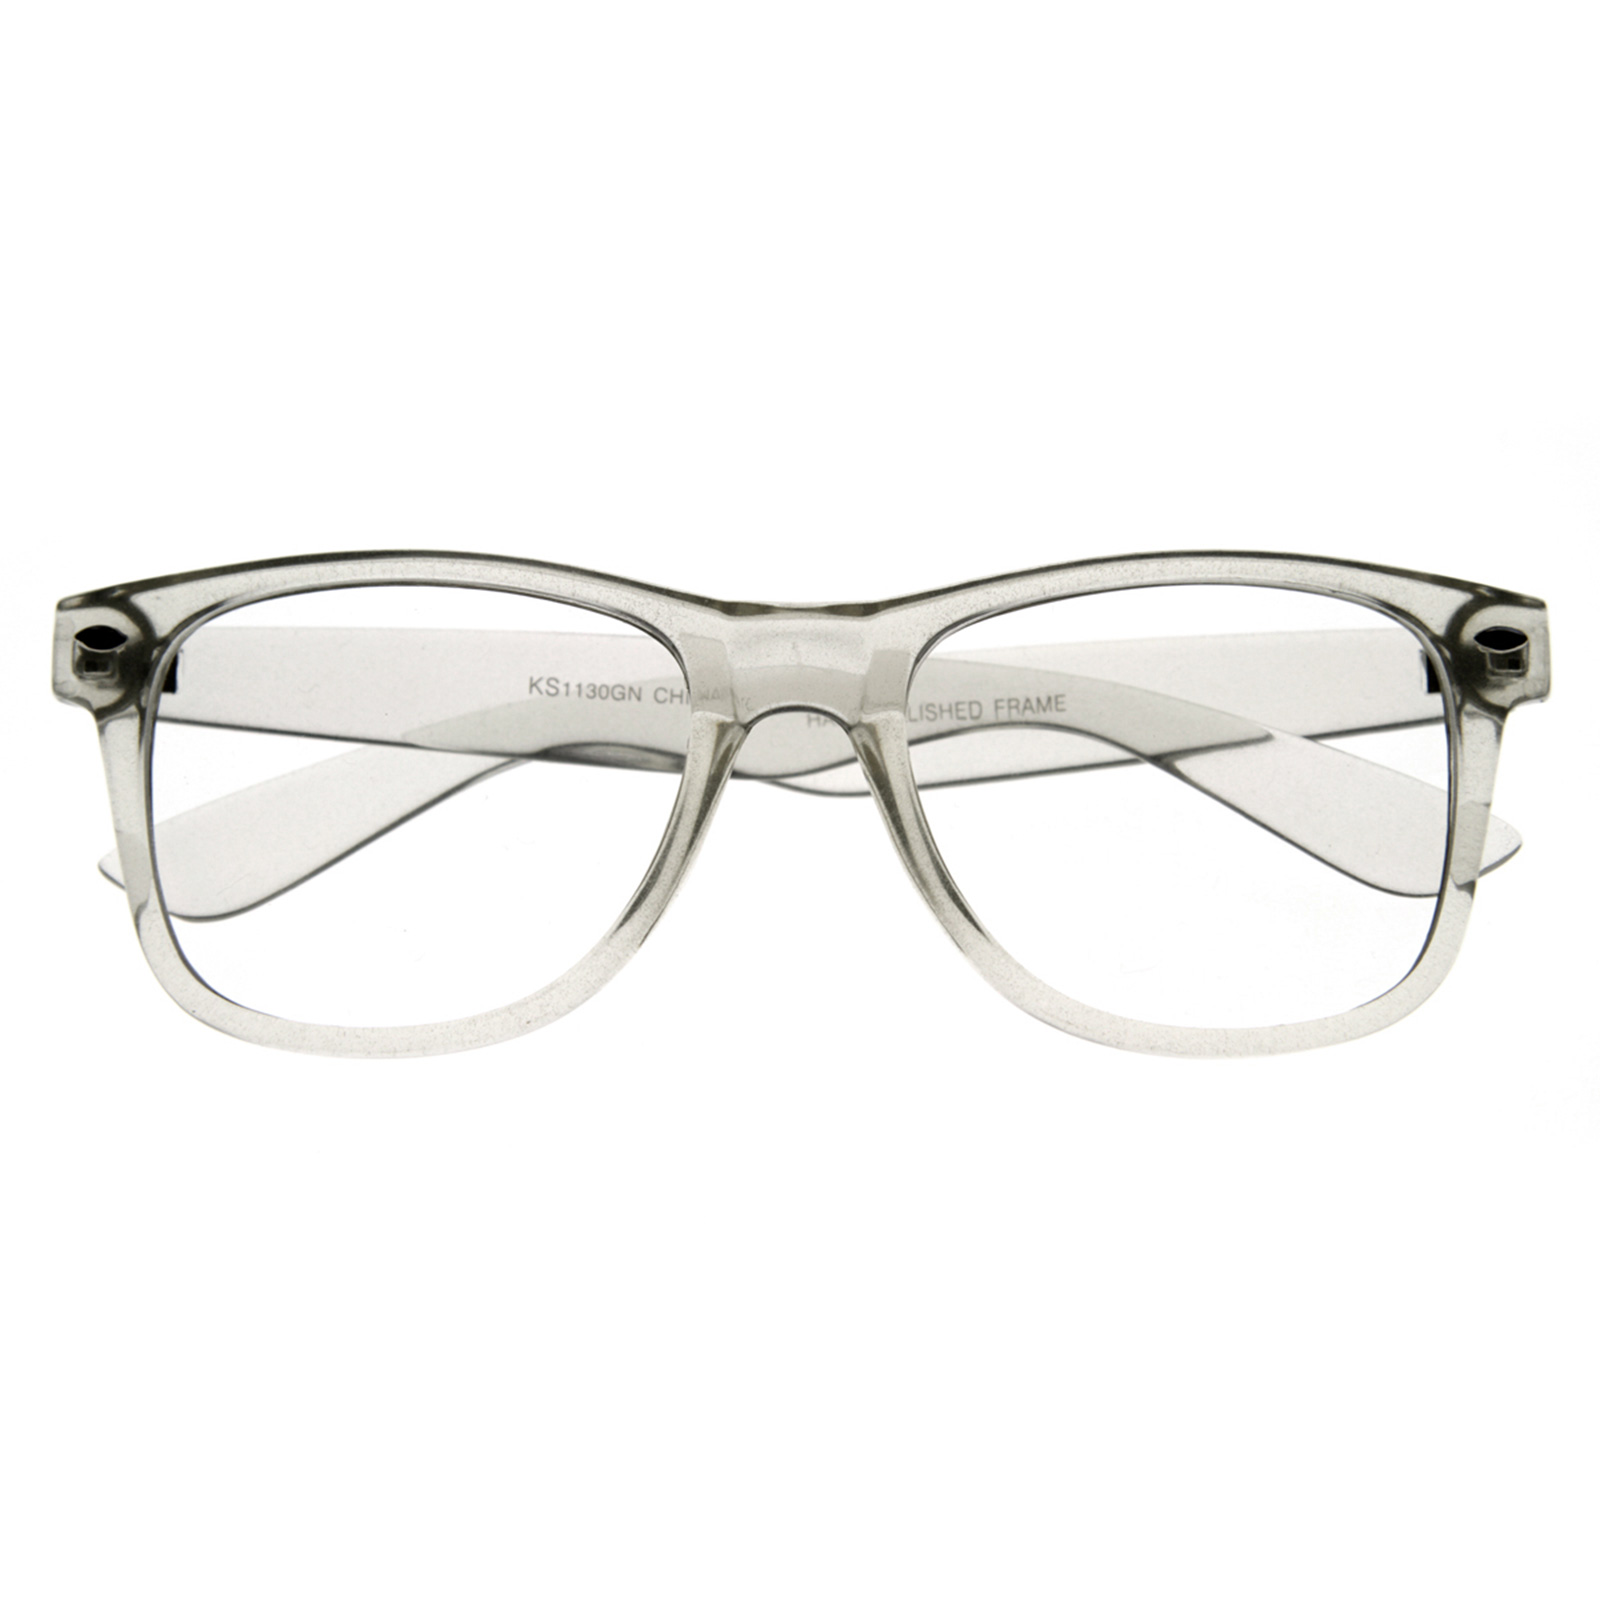 Eyeglass Frames Crystal Clear : Clear Transparent Translucent Crystal Frame Clear Lens ...